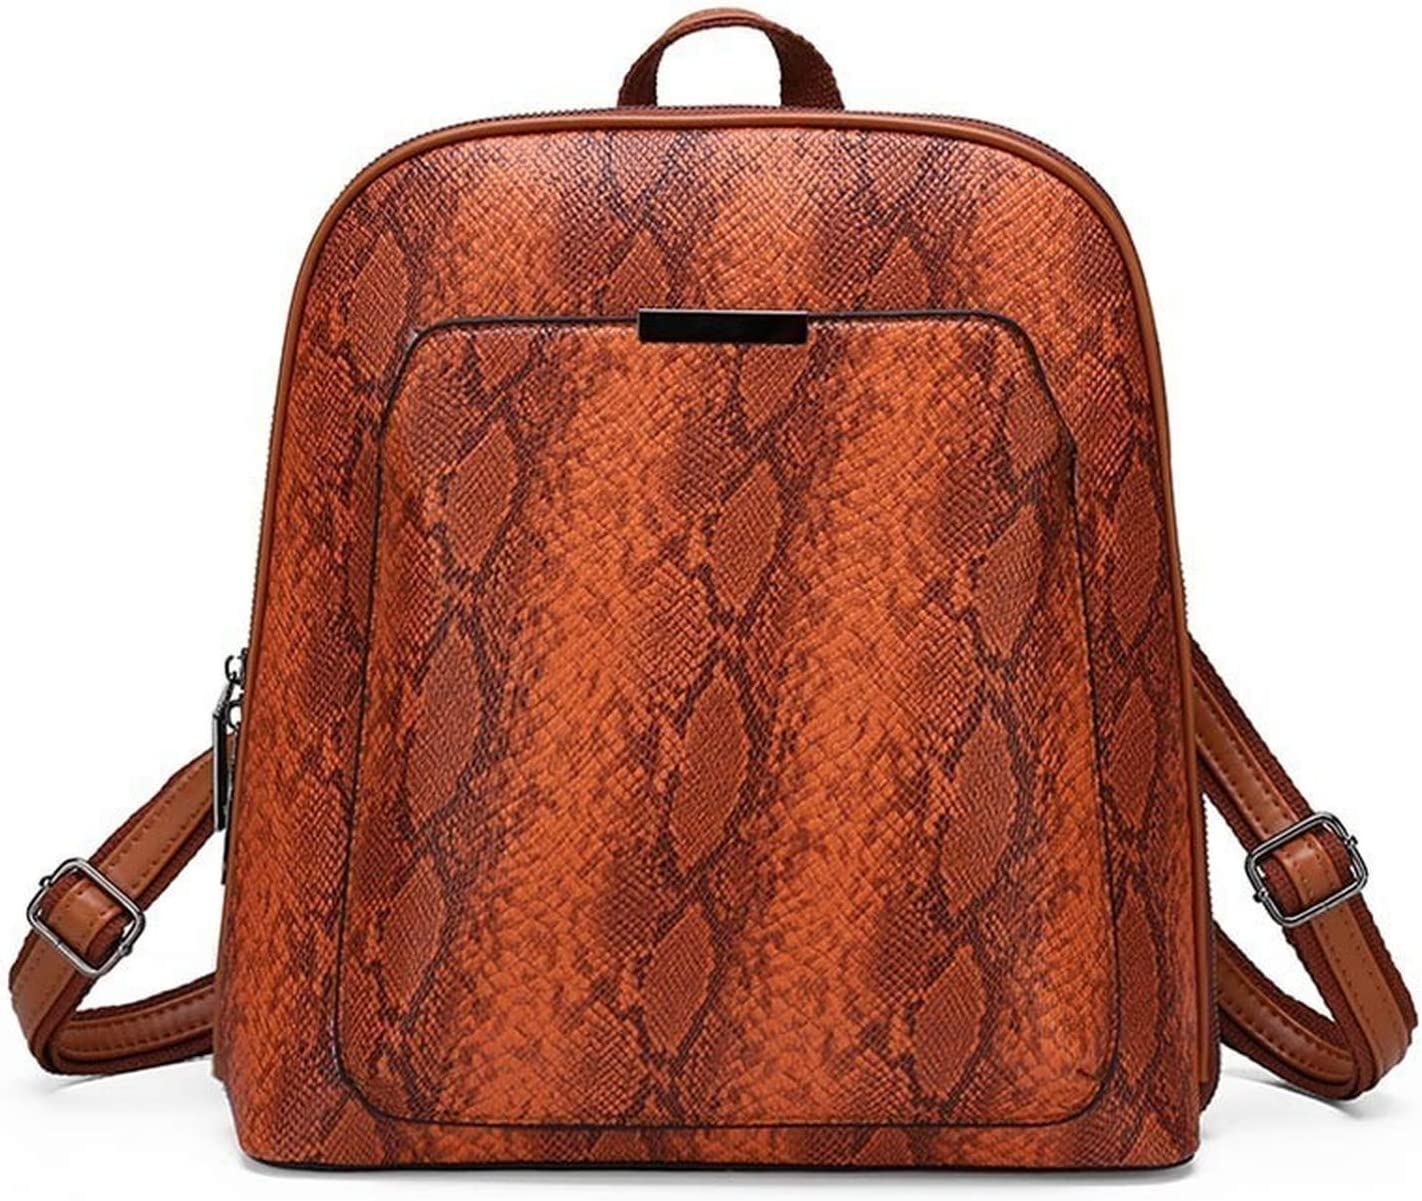 Vintage Women Backpack Serpentine Leopard School Bags for Teenage Girls Shoulder Bag Female Leather Backpacks Mochilas Mujer,Gray,32x29x12.5cm